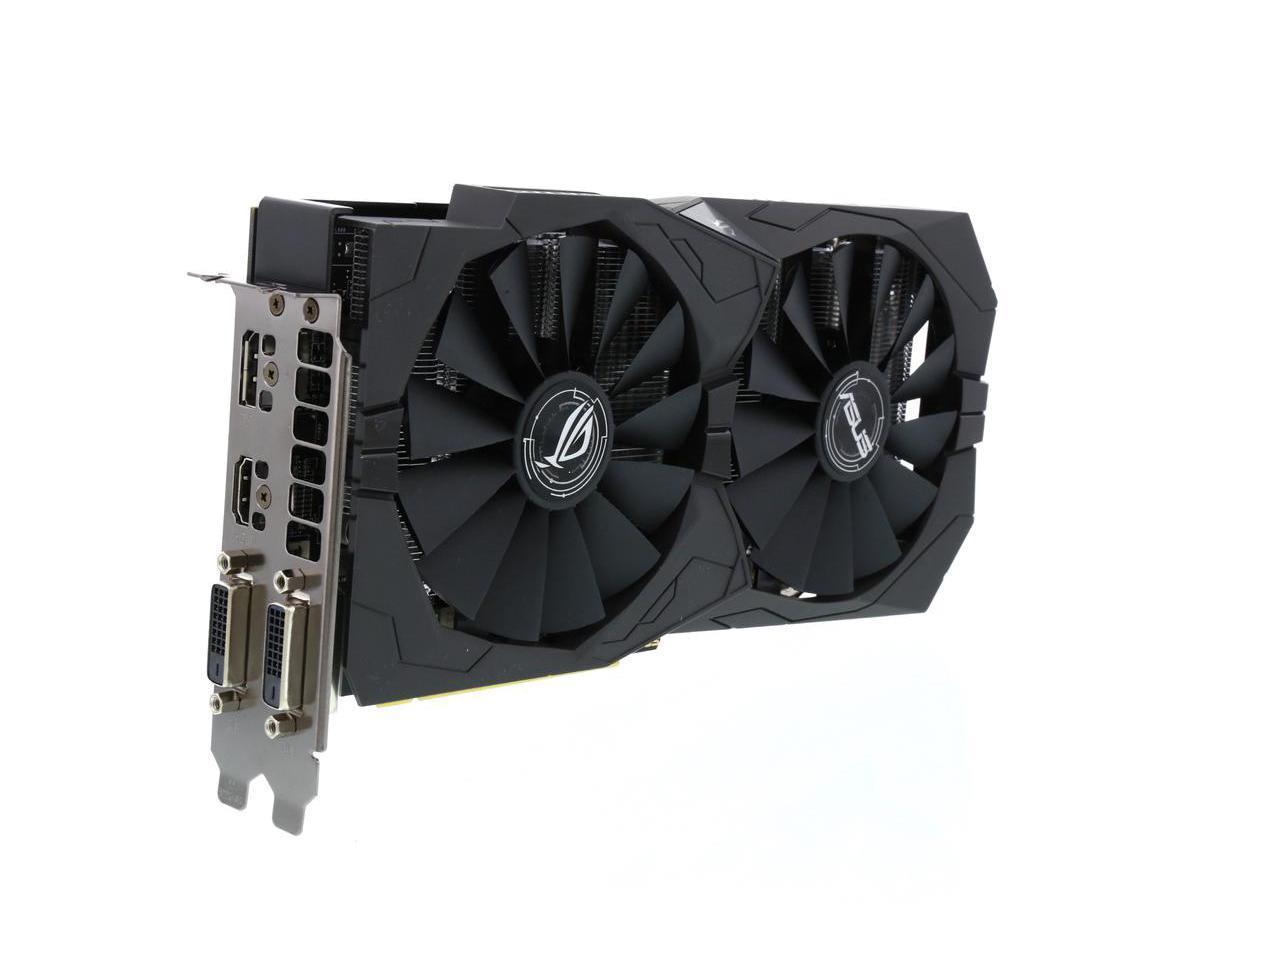 ASUS ROG Strix Radeon RX 570 OC Edition Graphics Card + 2 Games $130 + Free Shipping